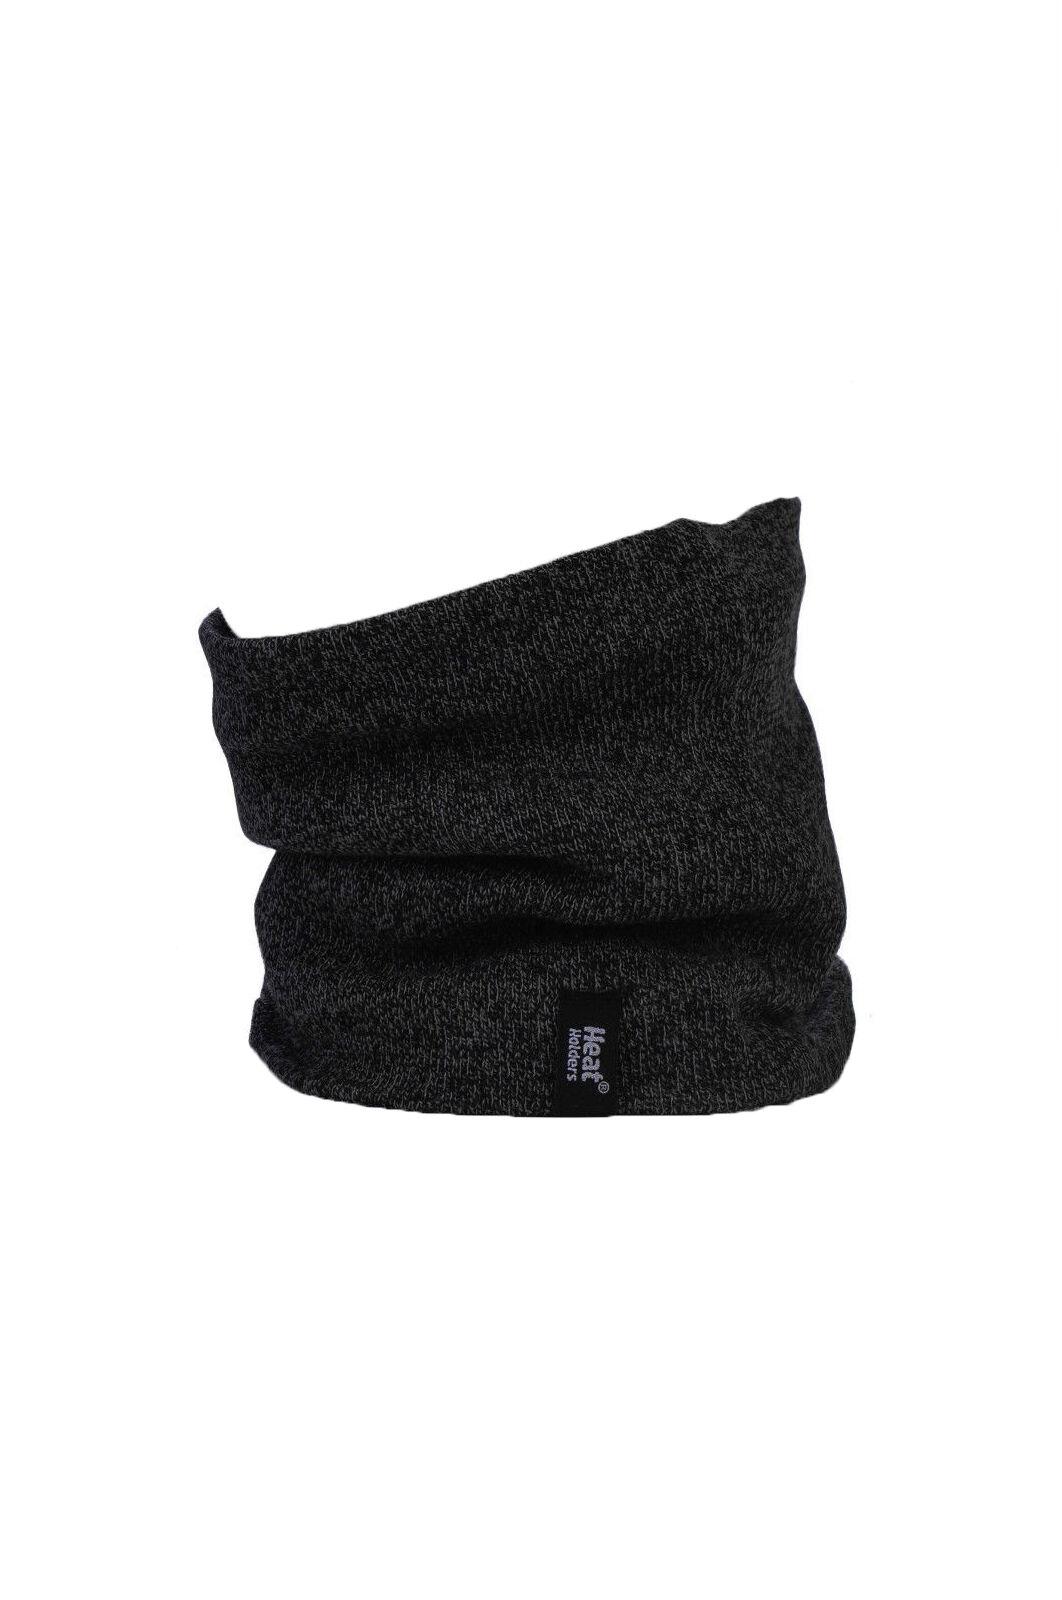 Heat Holders - Mens Ski Clothes Set including Ski Socks, Gloves and Neckwarmer